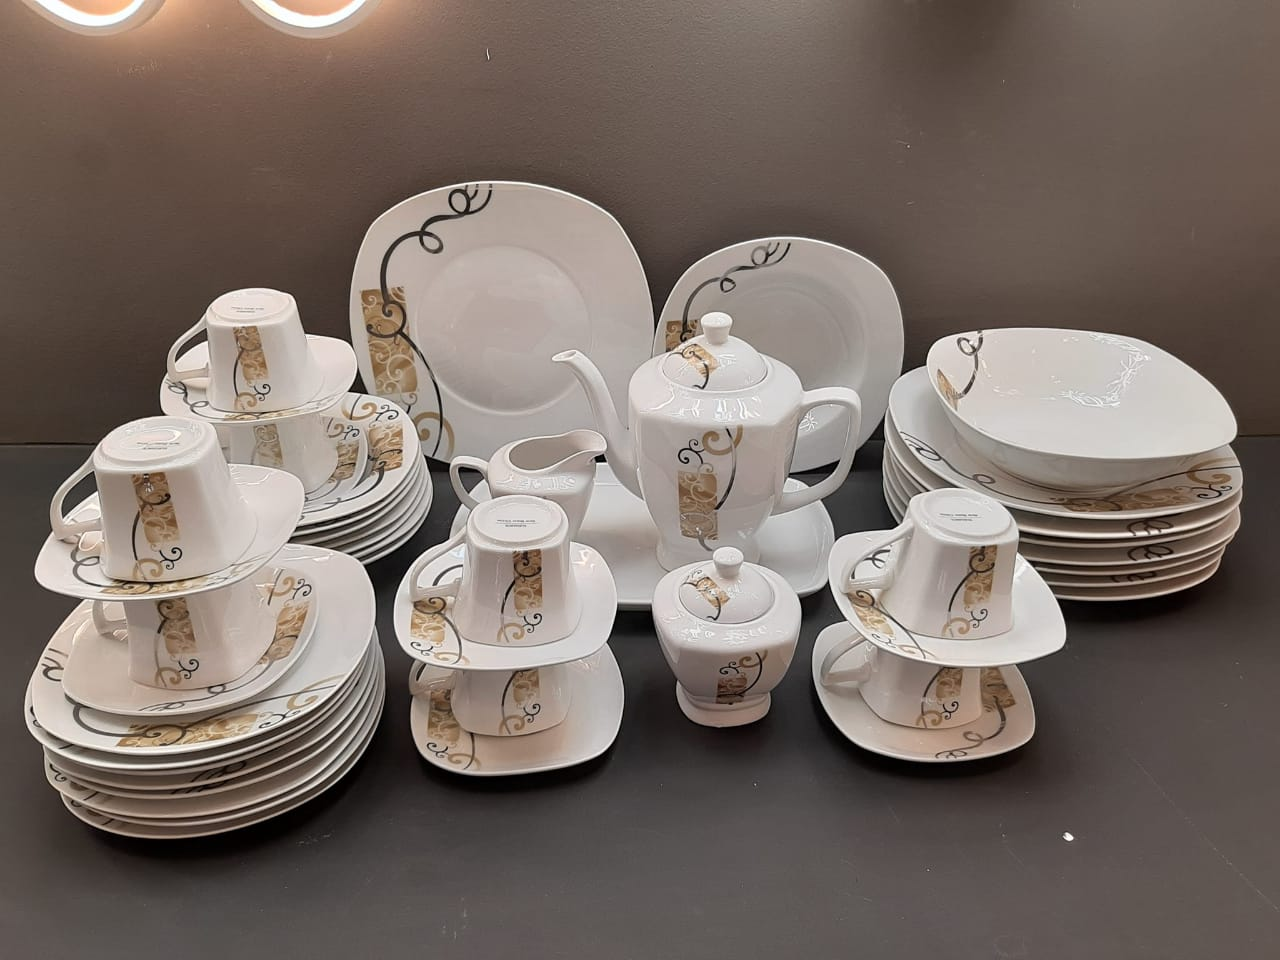 47 pcs Dinner Set Plates - Includes Plates , cups, kettle, jar, sugar bowl, serving dish